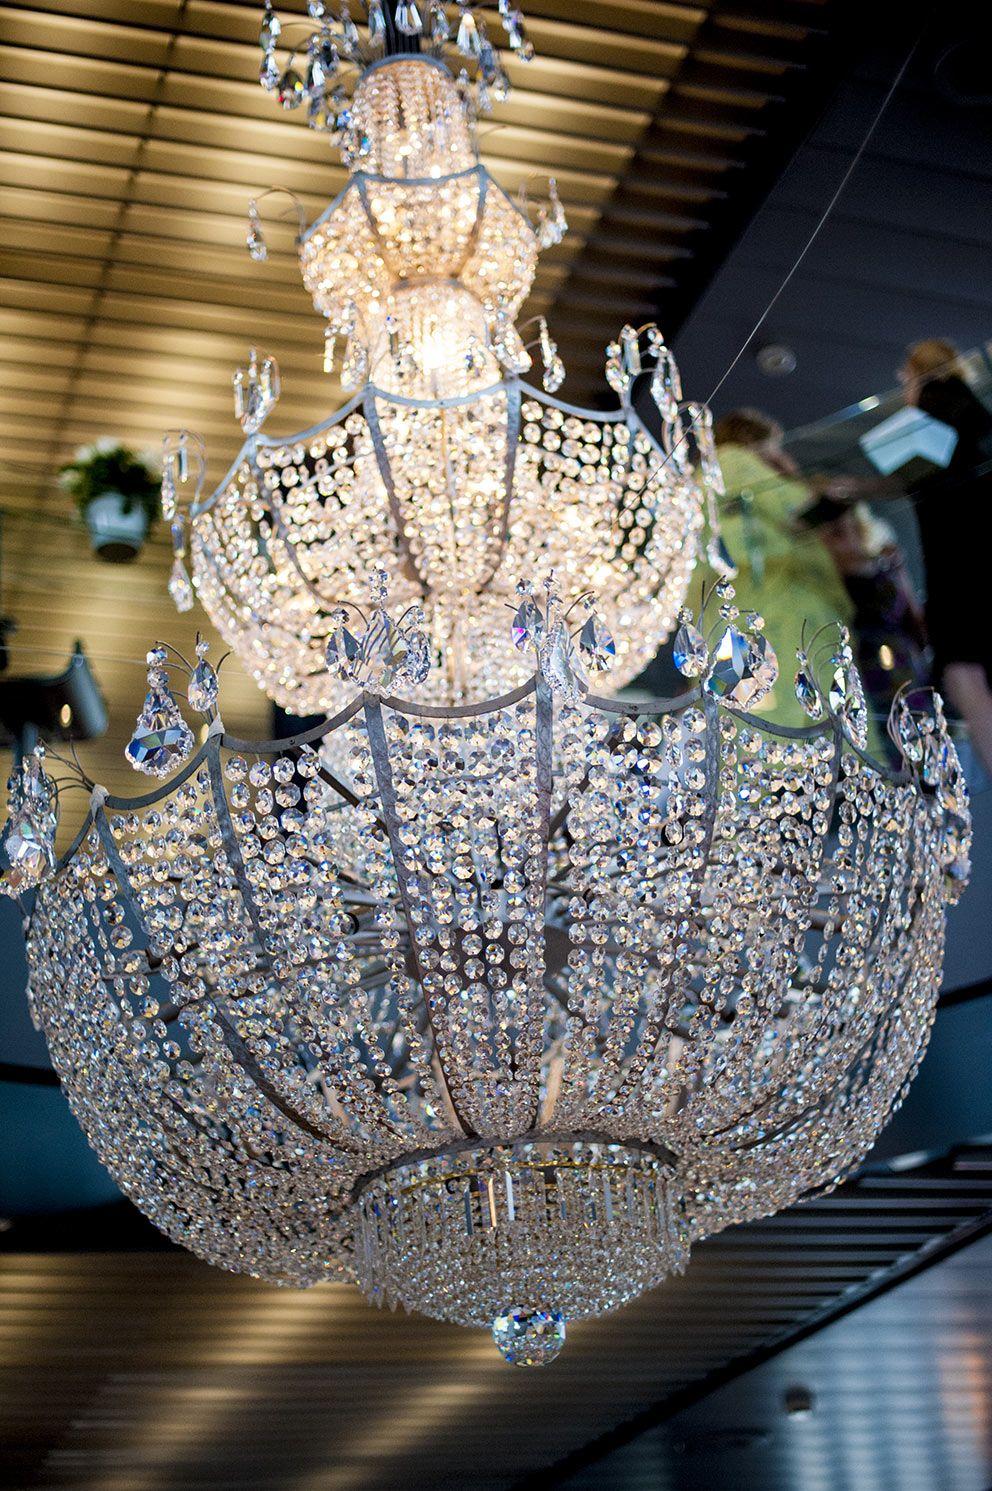 Queen elizabeth chandeliers to die for pty ltd of queen elizabeth chandeliers to die for pty ltd aloadofball Choice Image